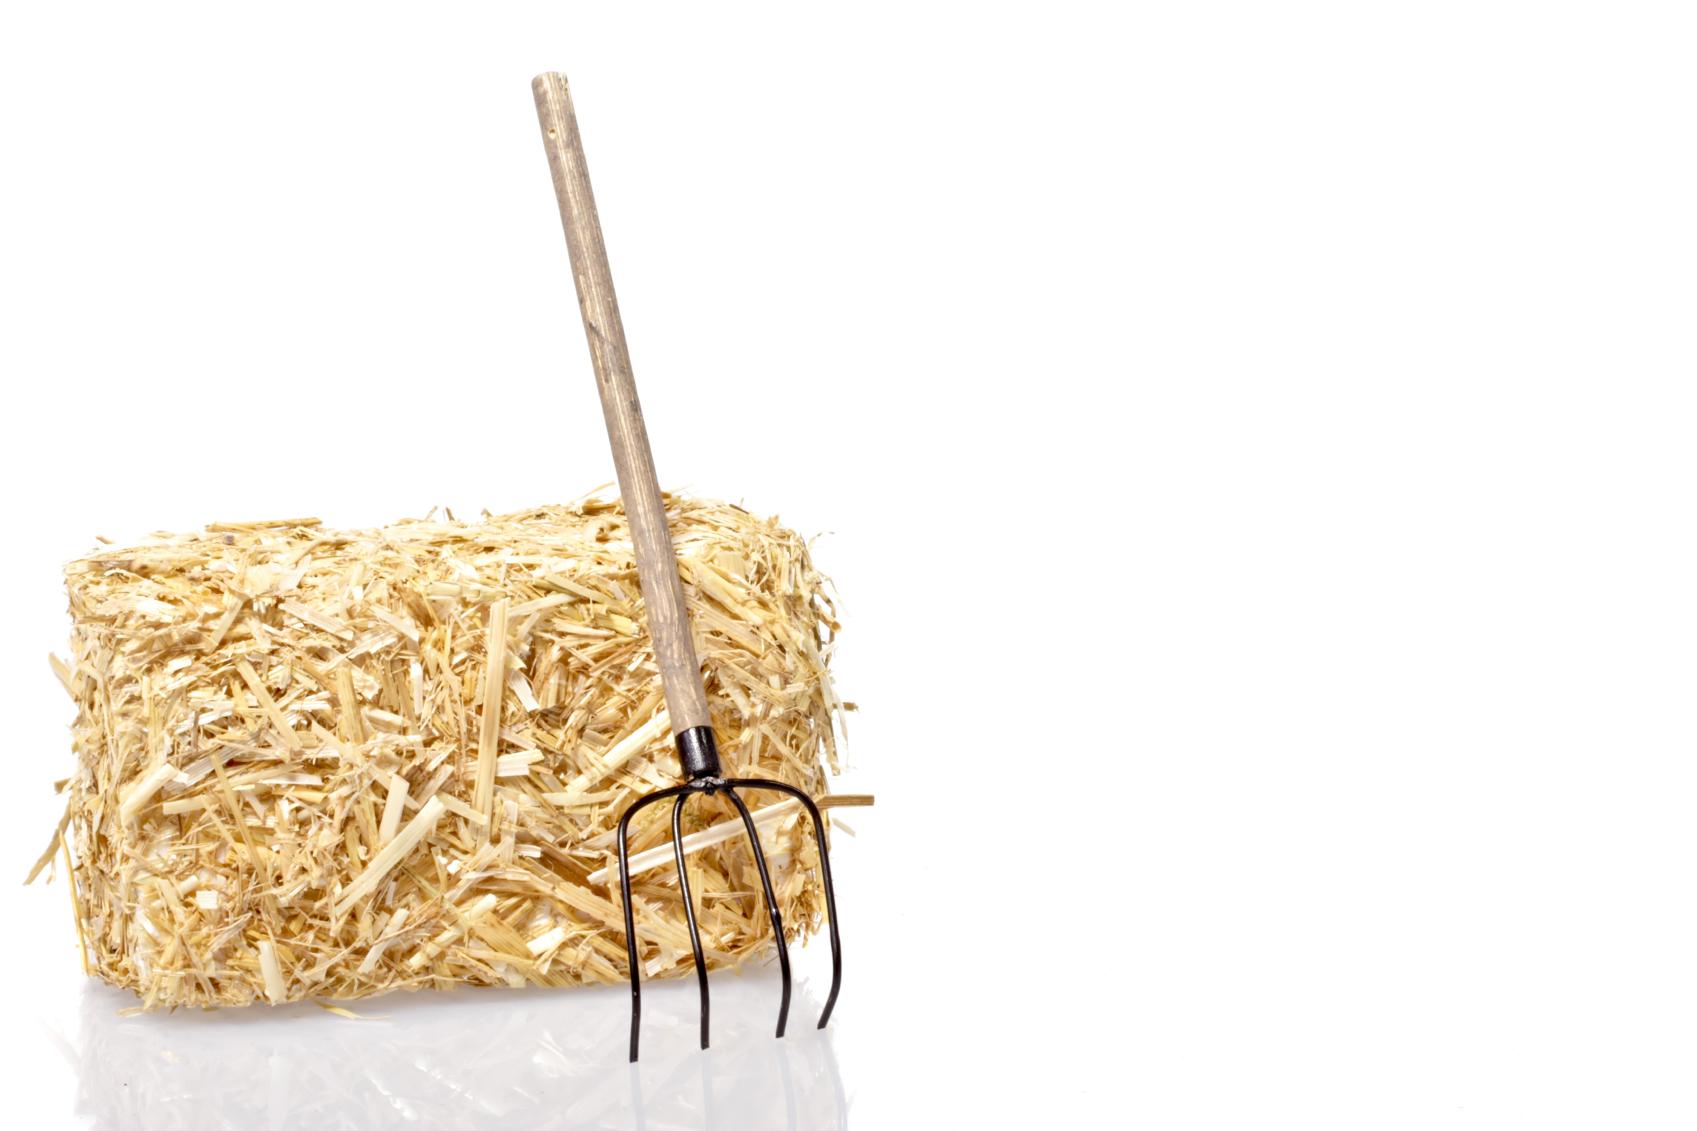 Neem jij regelmatig te veel hooi op je vork?